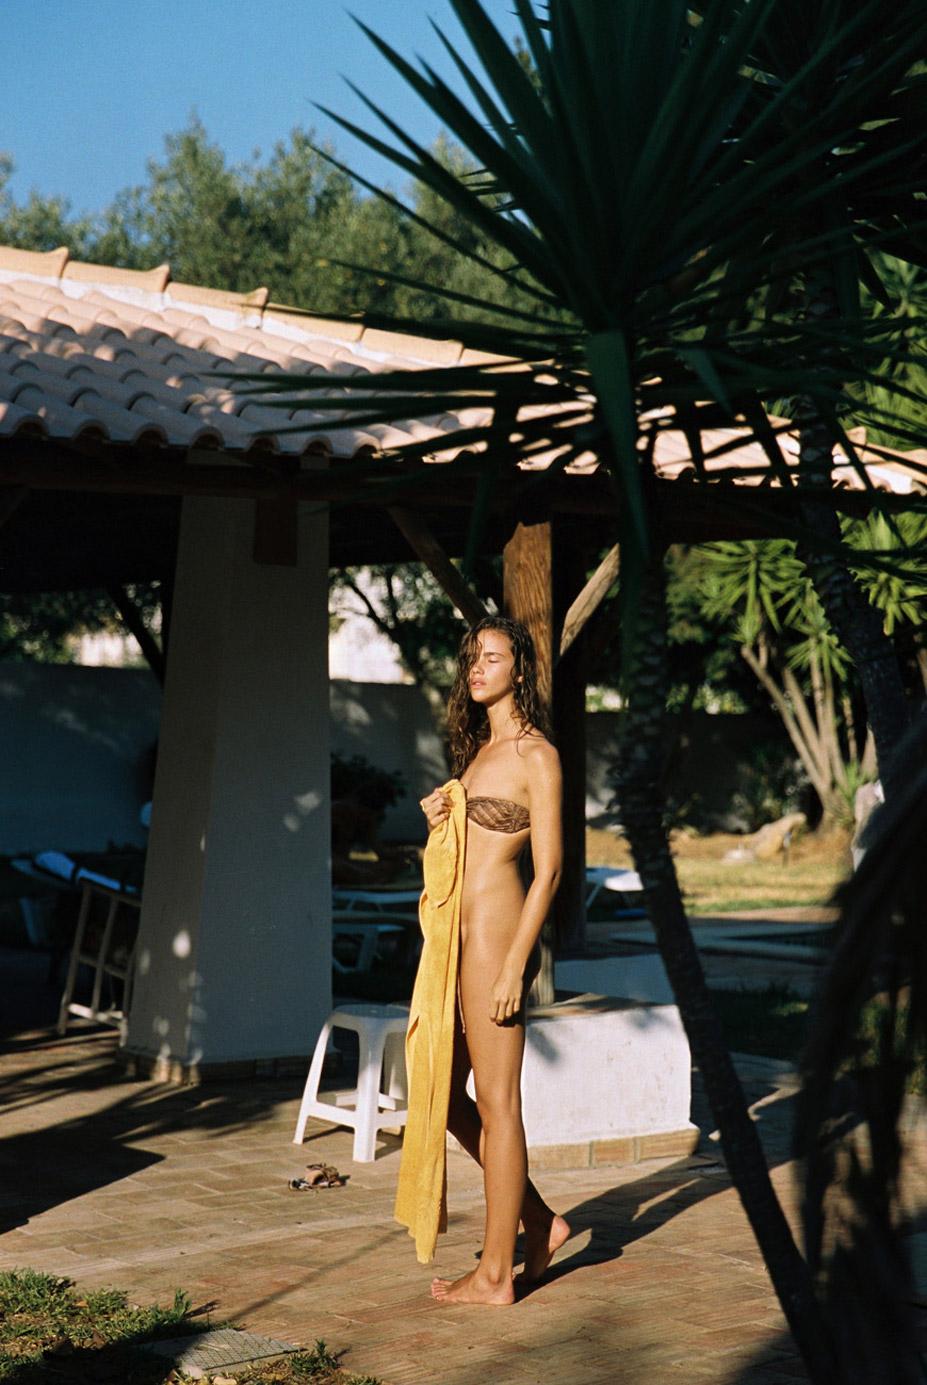 теплый летний день у бассейна с Дженой Голдсак / Jena Goldsack by Cameron Hammond